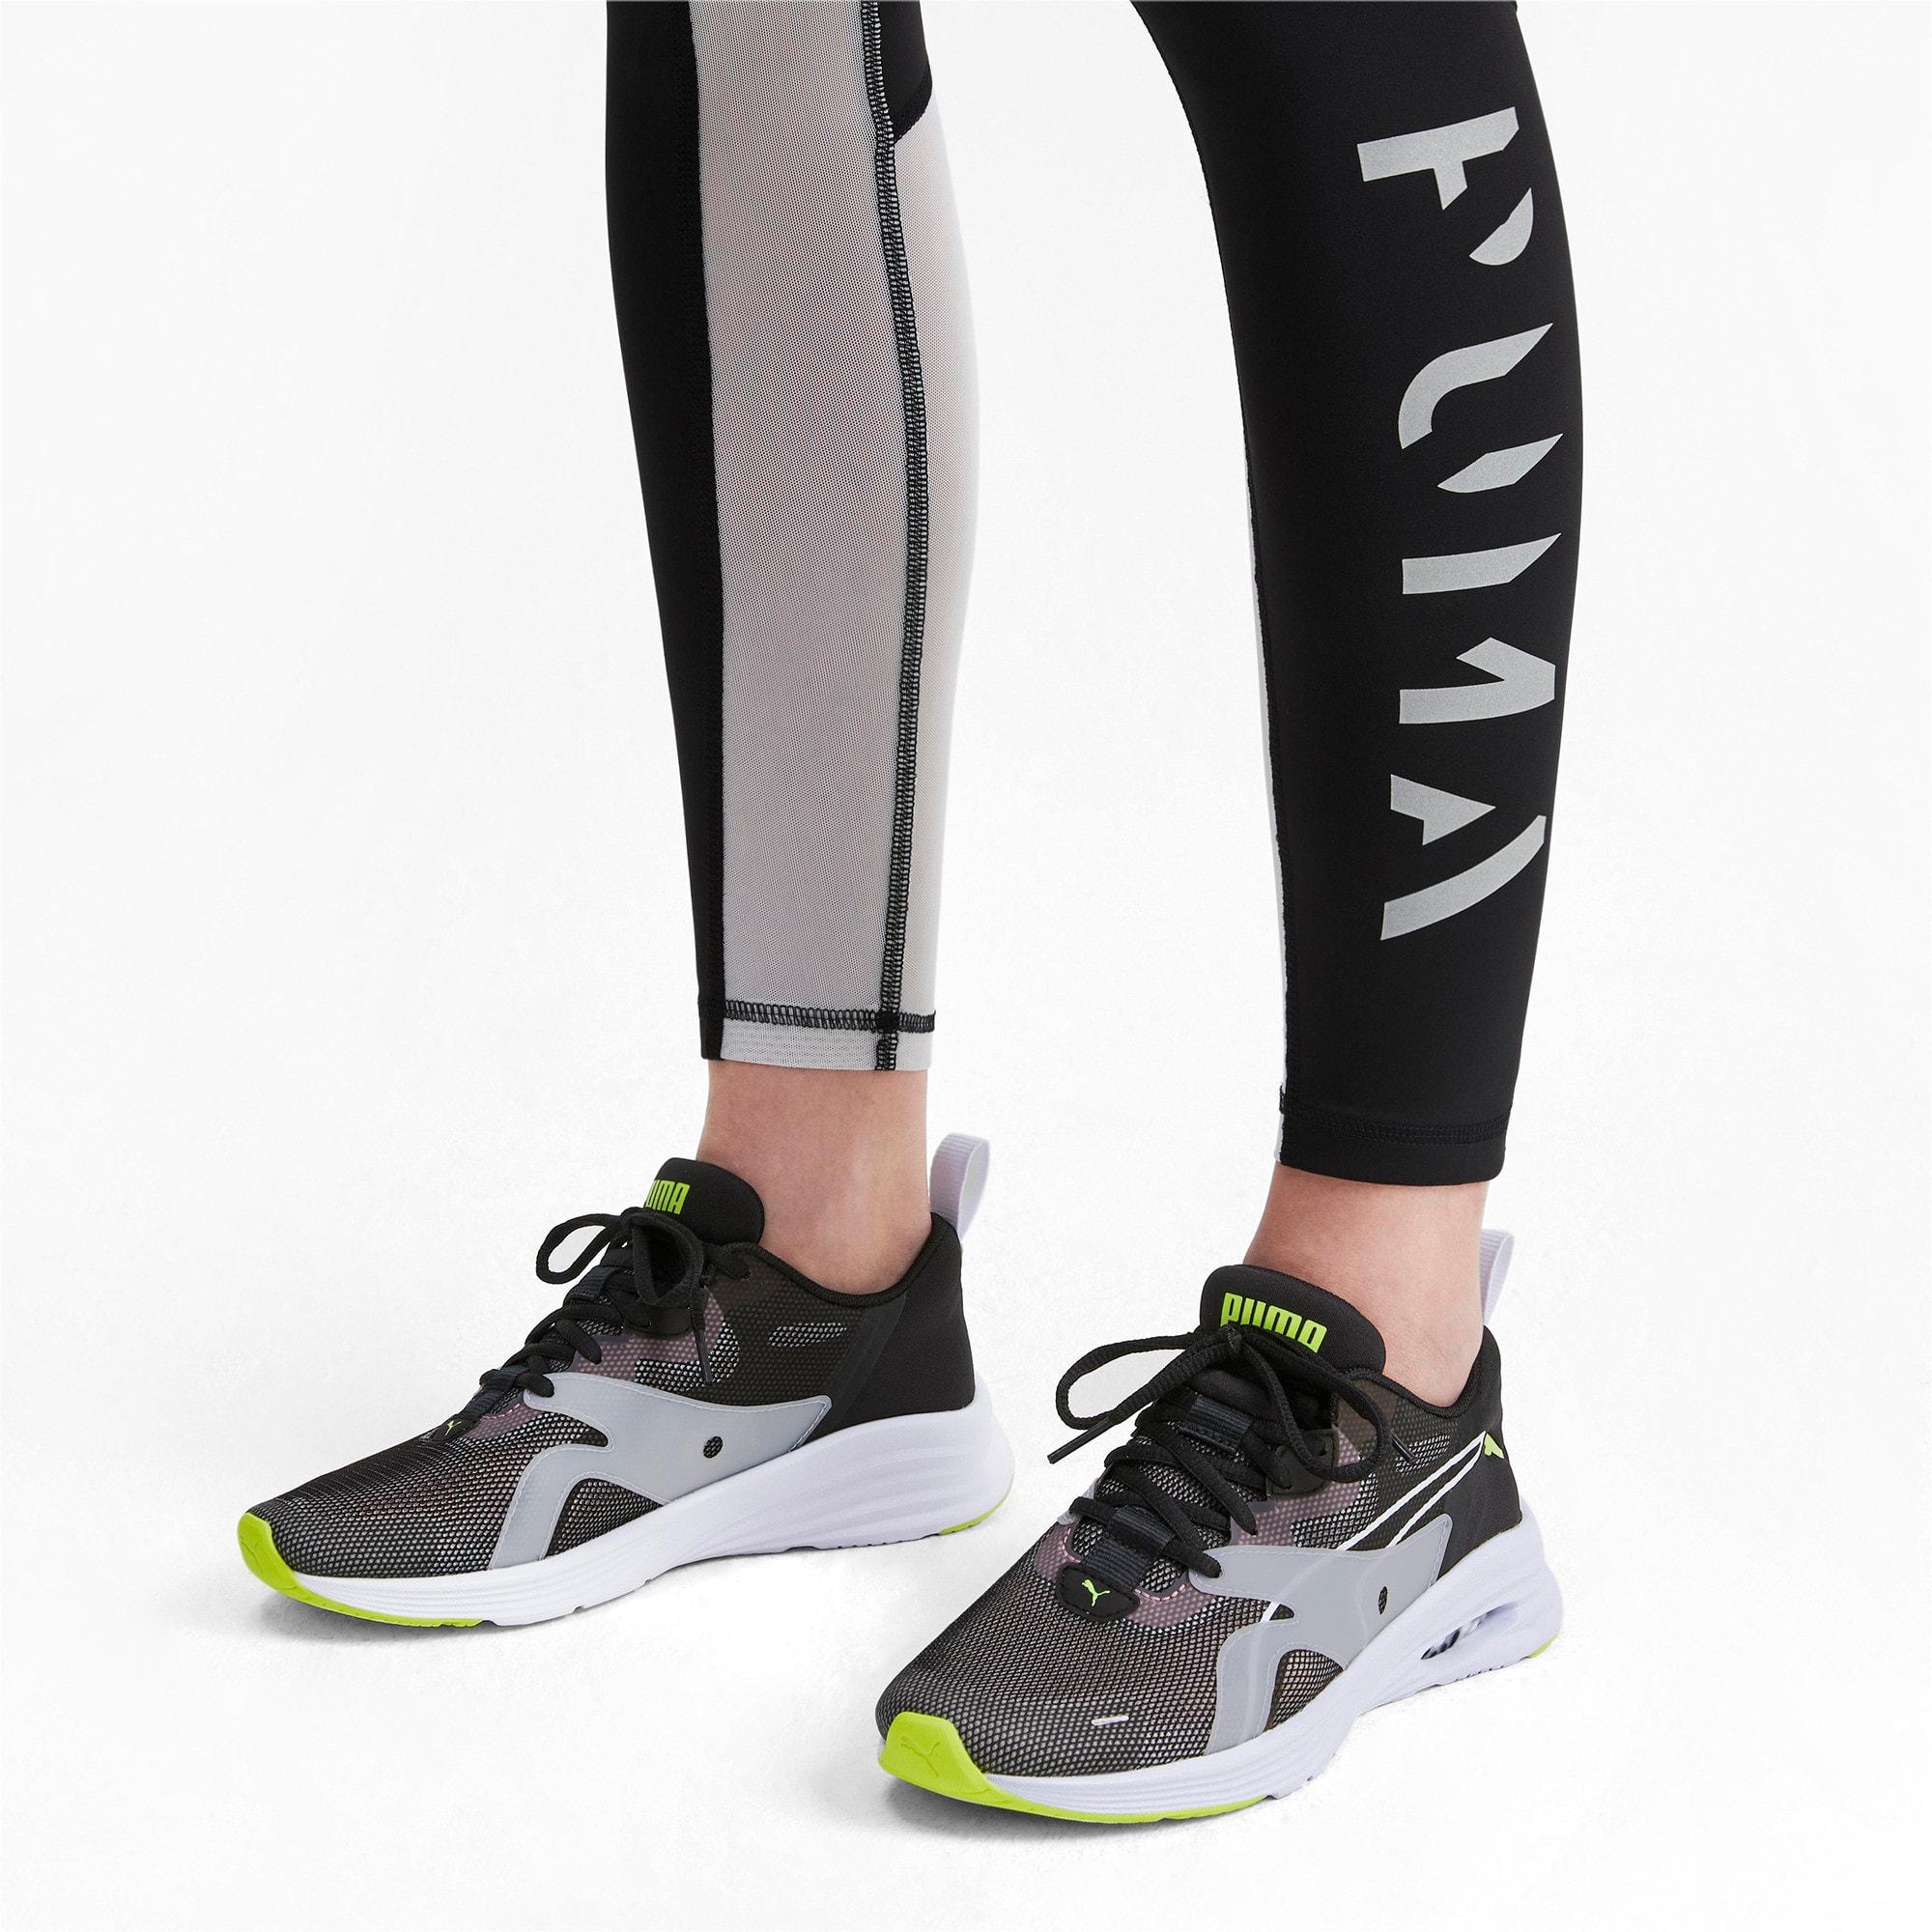 Thumbnail 2 of HYBRID Fuego Shift Women's Running Shoes, Puma Black-Bridal Rose, medium-IND